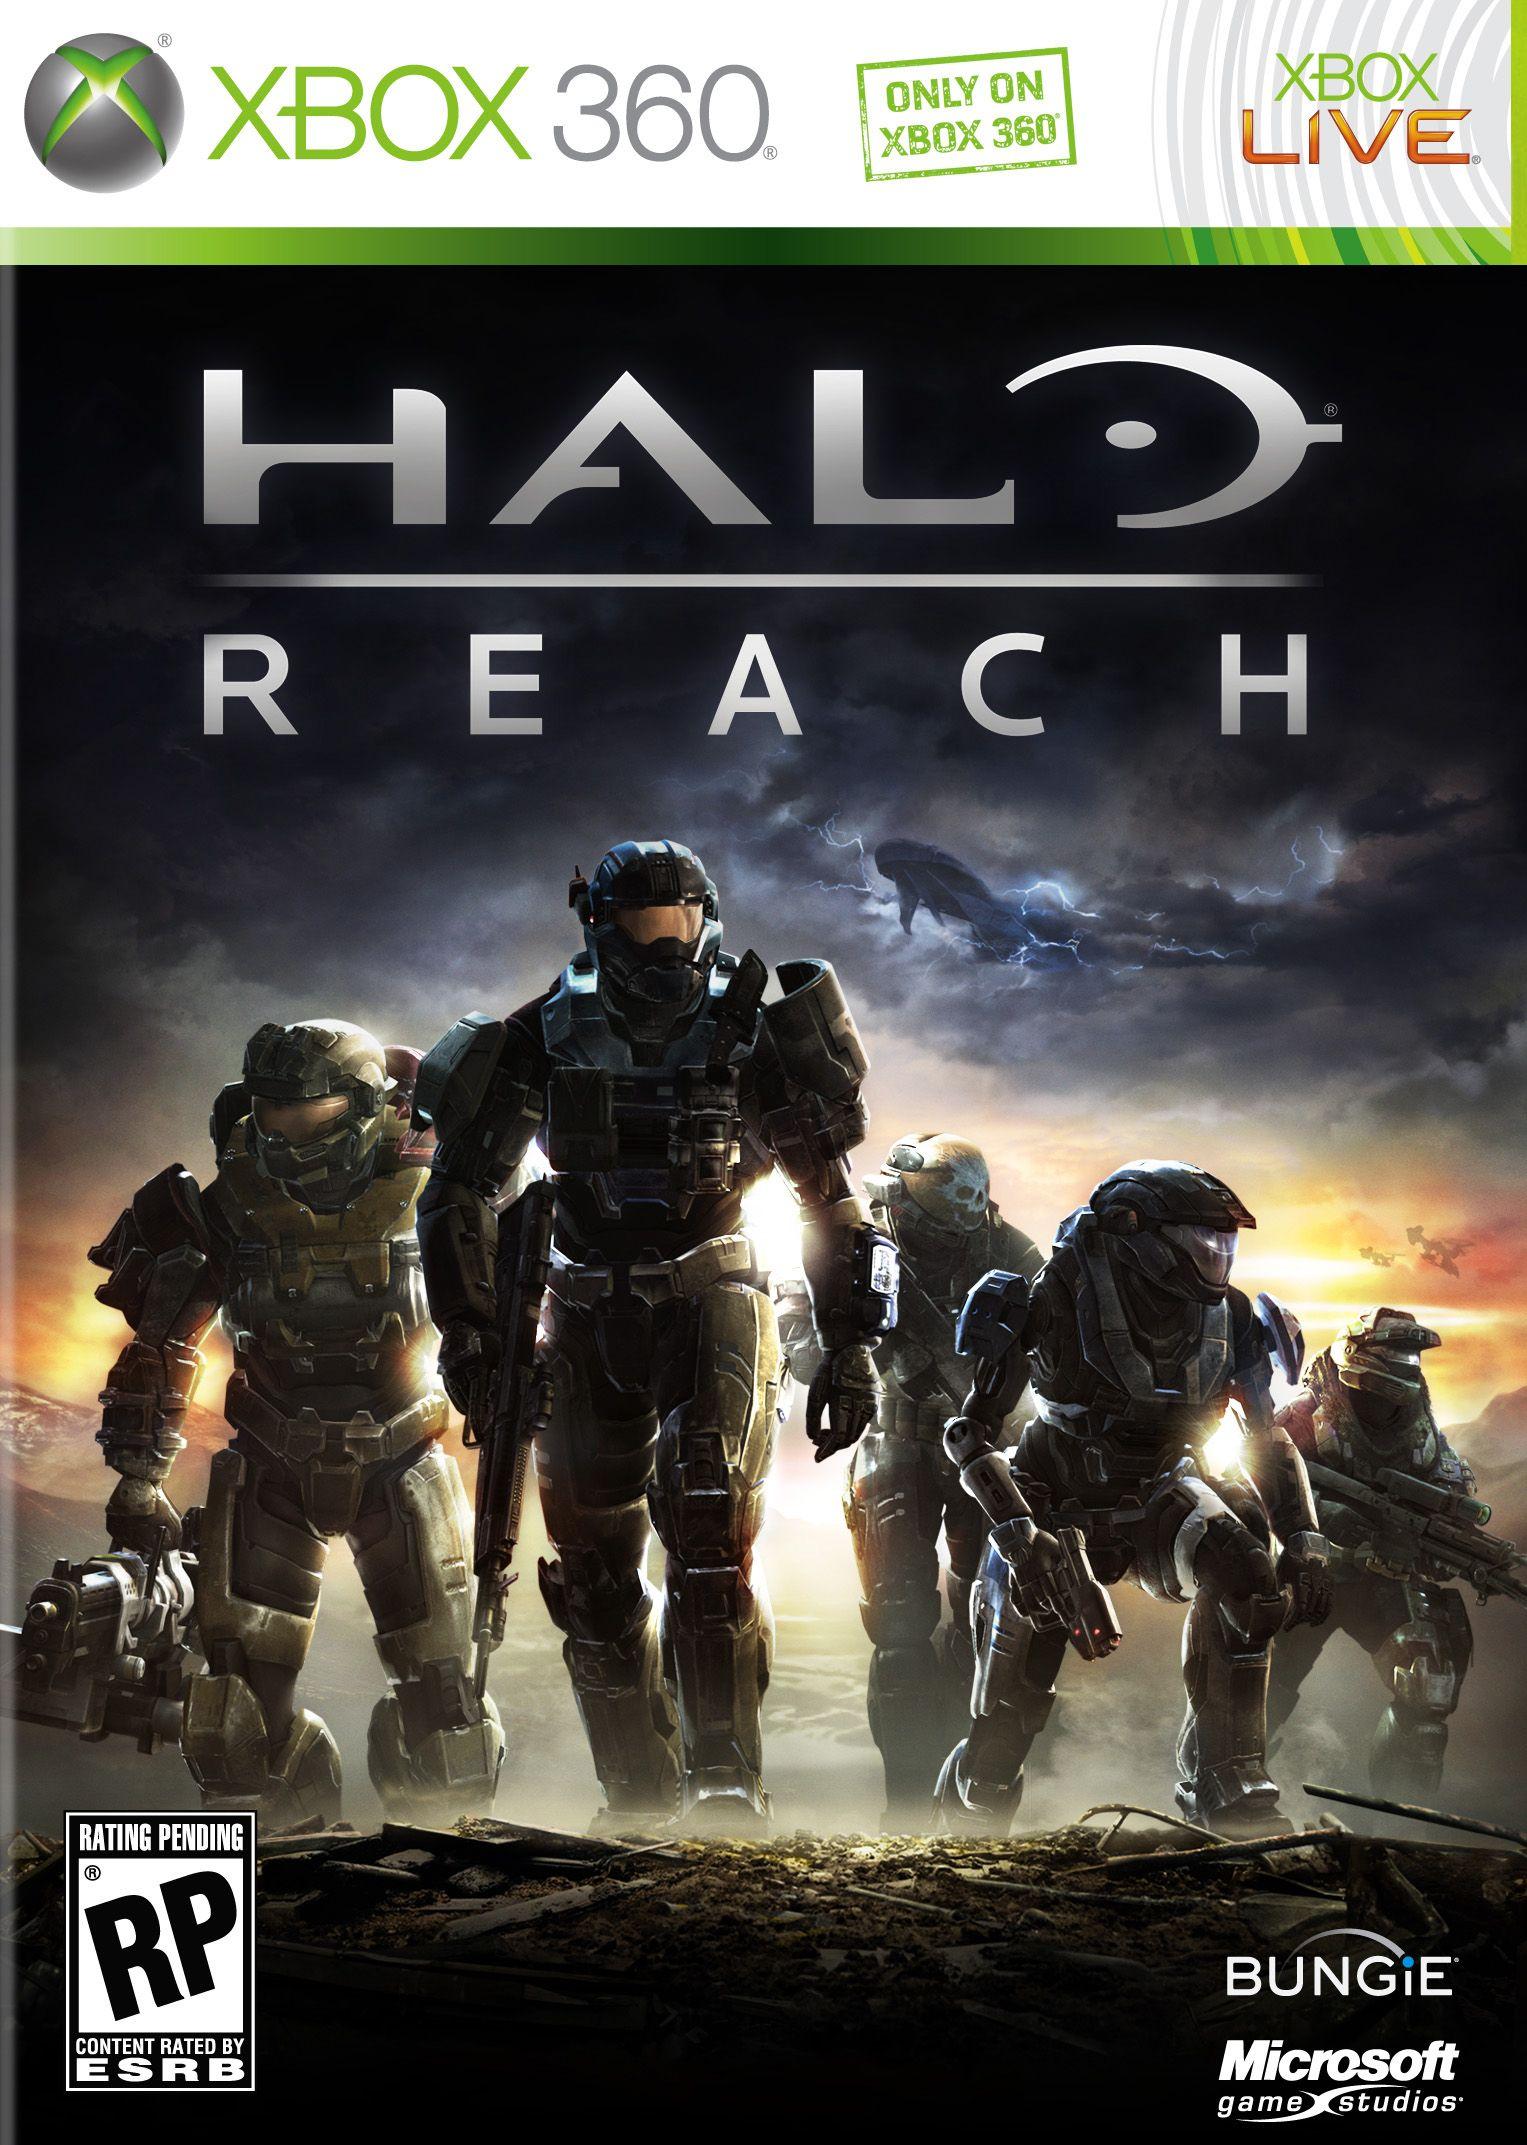 23 Ideas De Posters De Games Xbox 360 Xbox Juegos Para Xbox 360